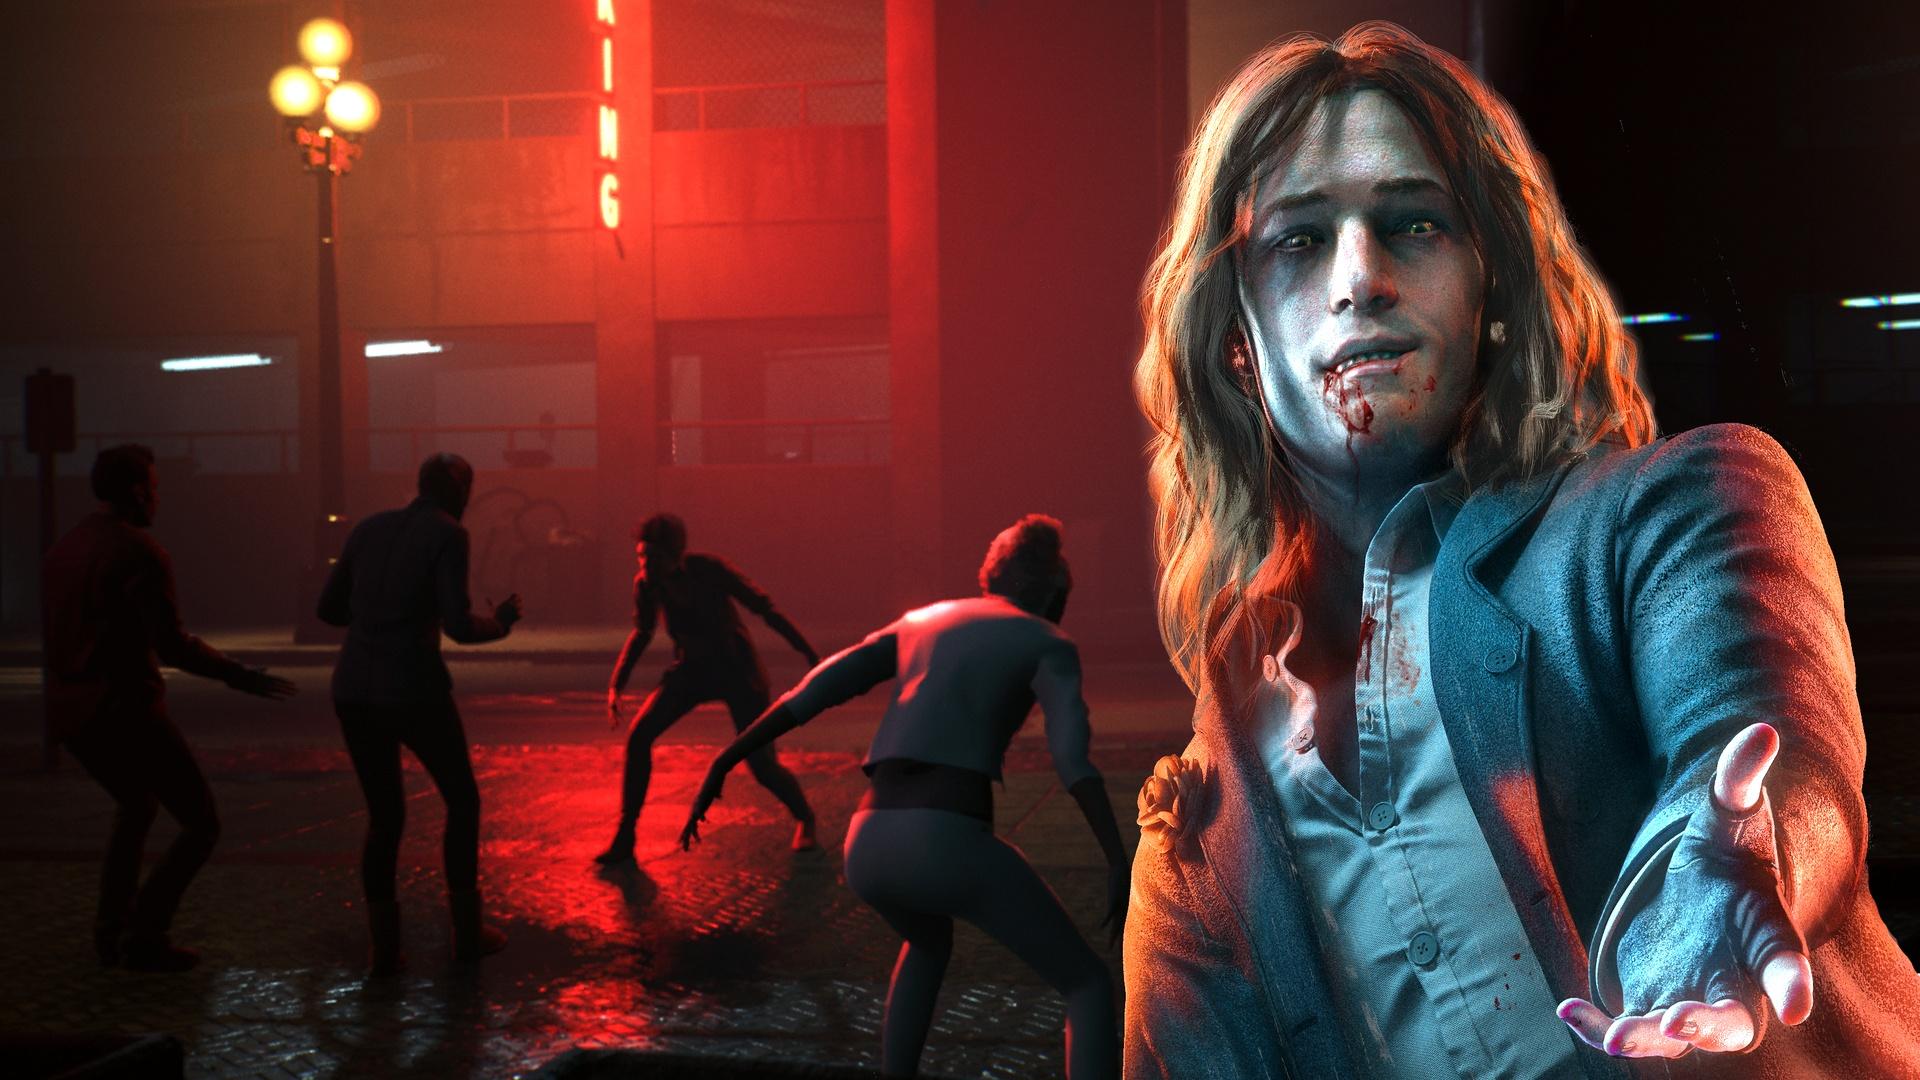 Došlo k odložení Vampire: The Masquerade – Bloodlines 2 na podzim 2020